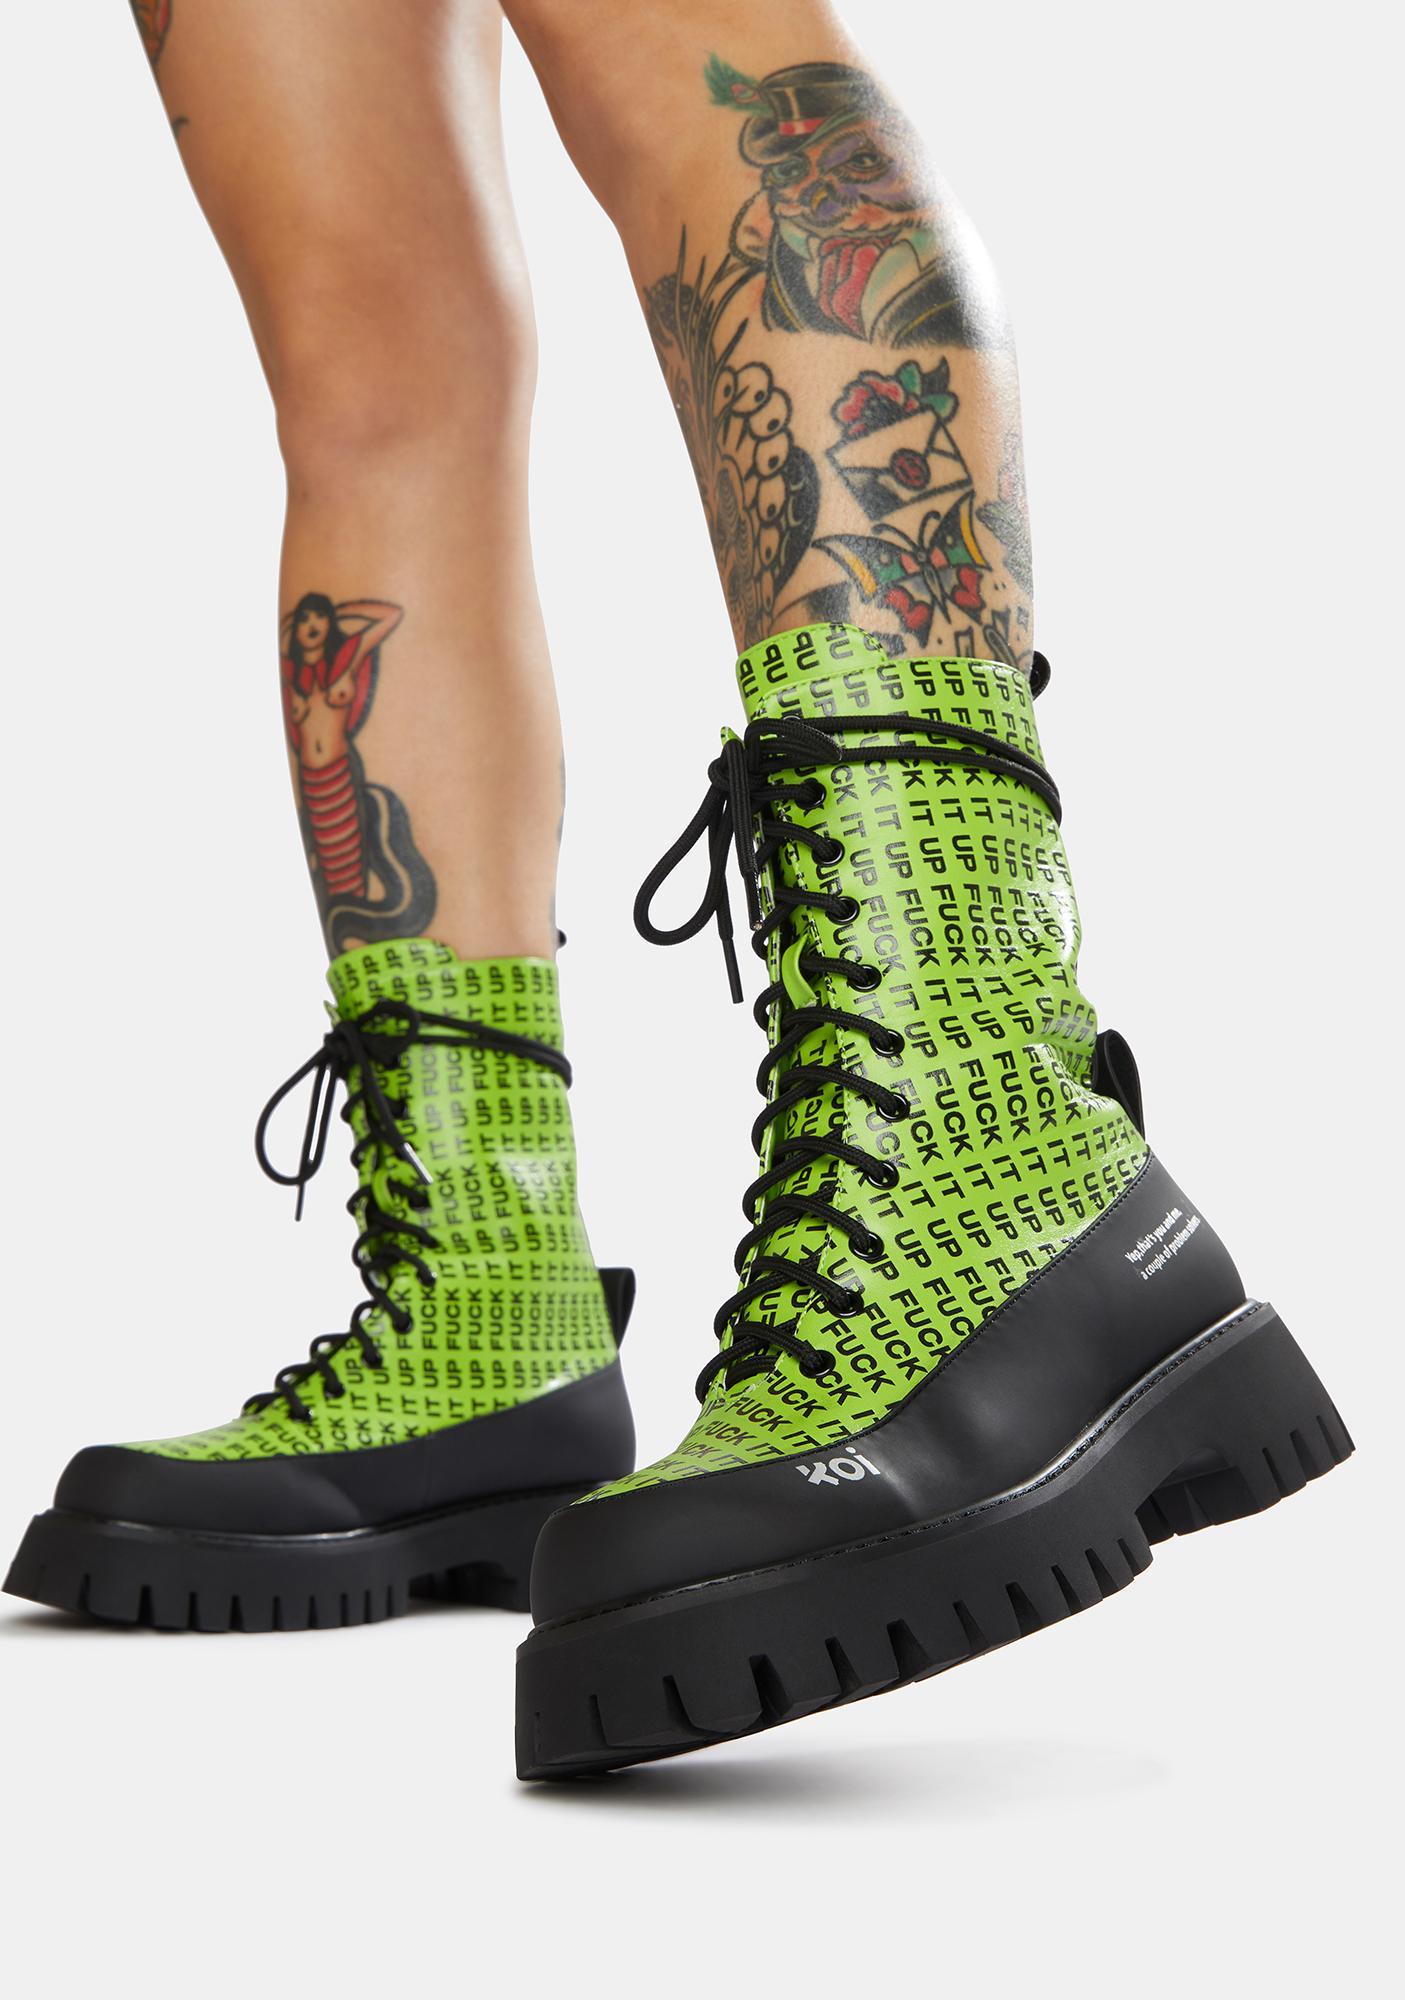 Koi Footwear F It Up Military Boots